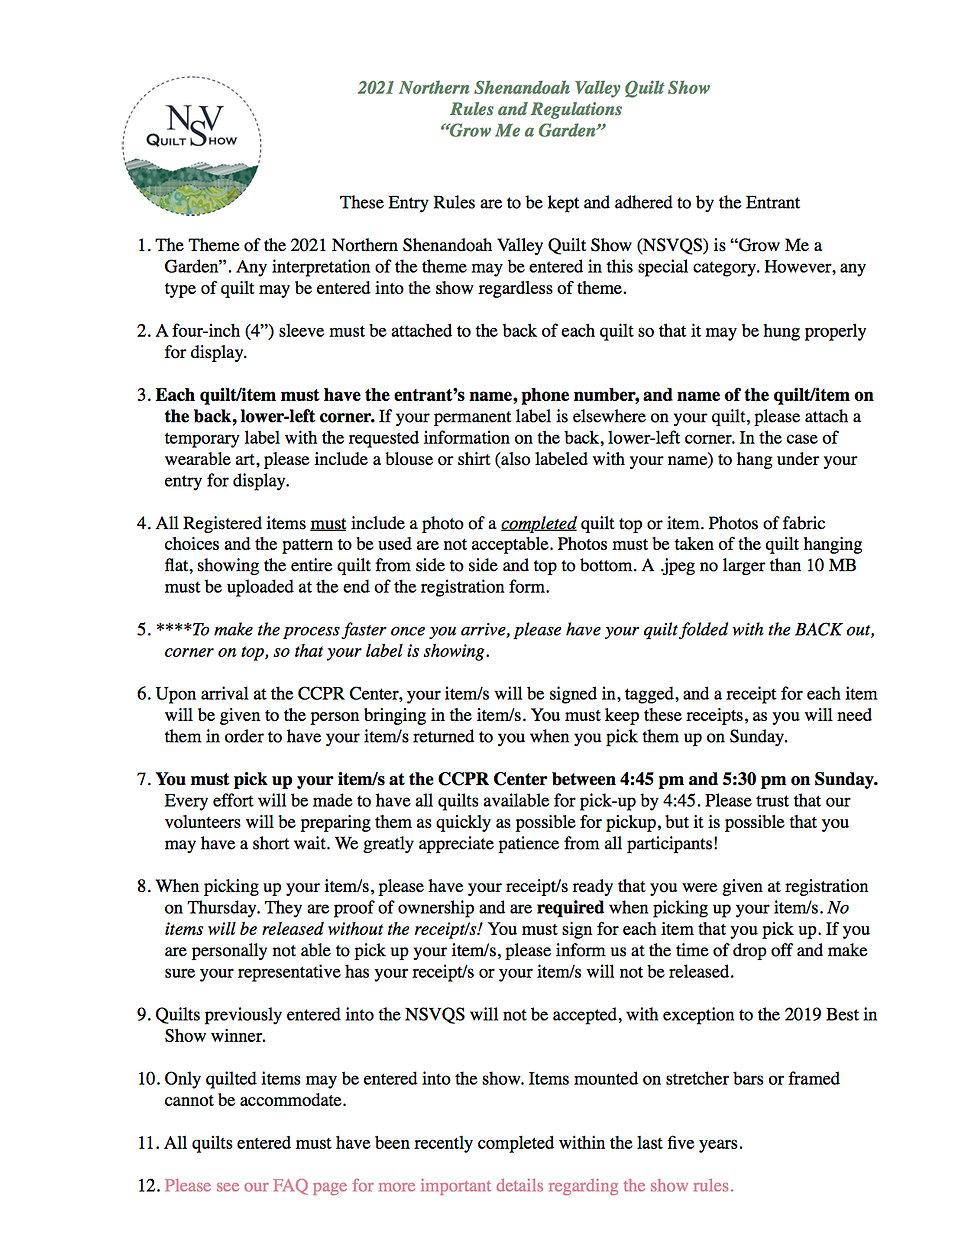 rules1.jpg